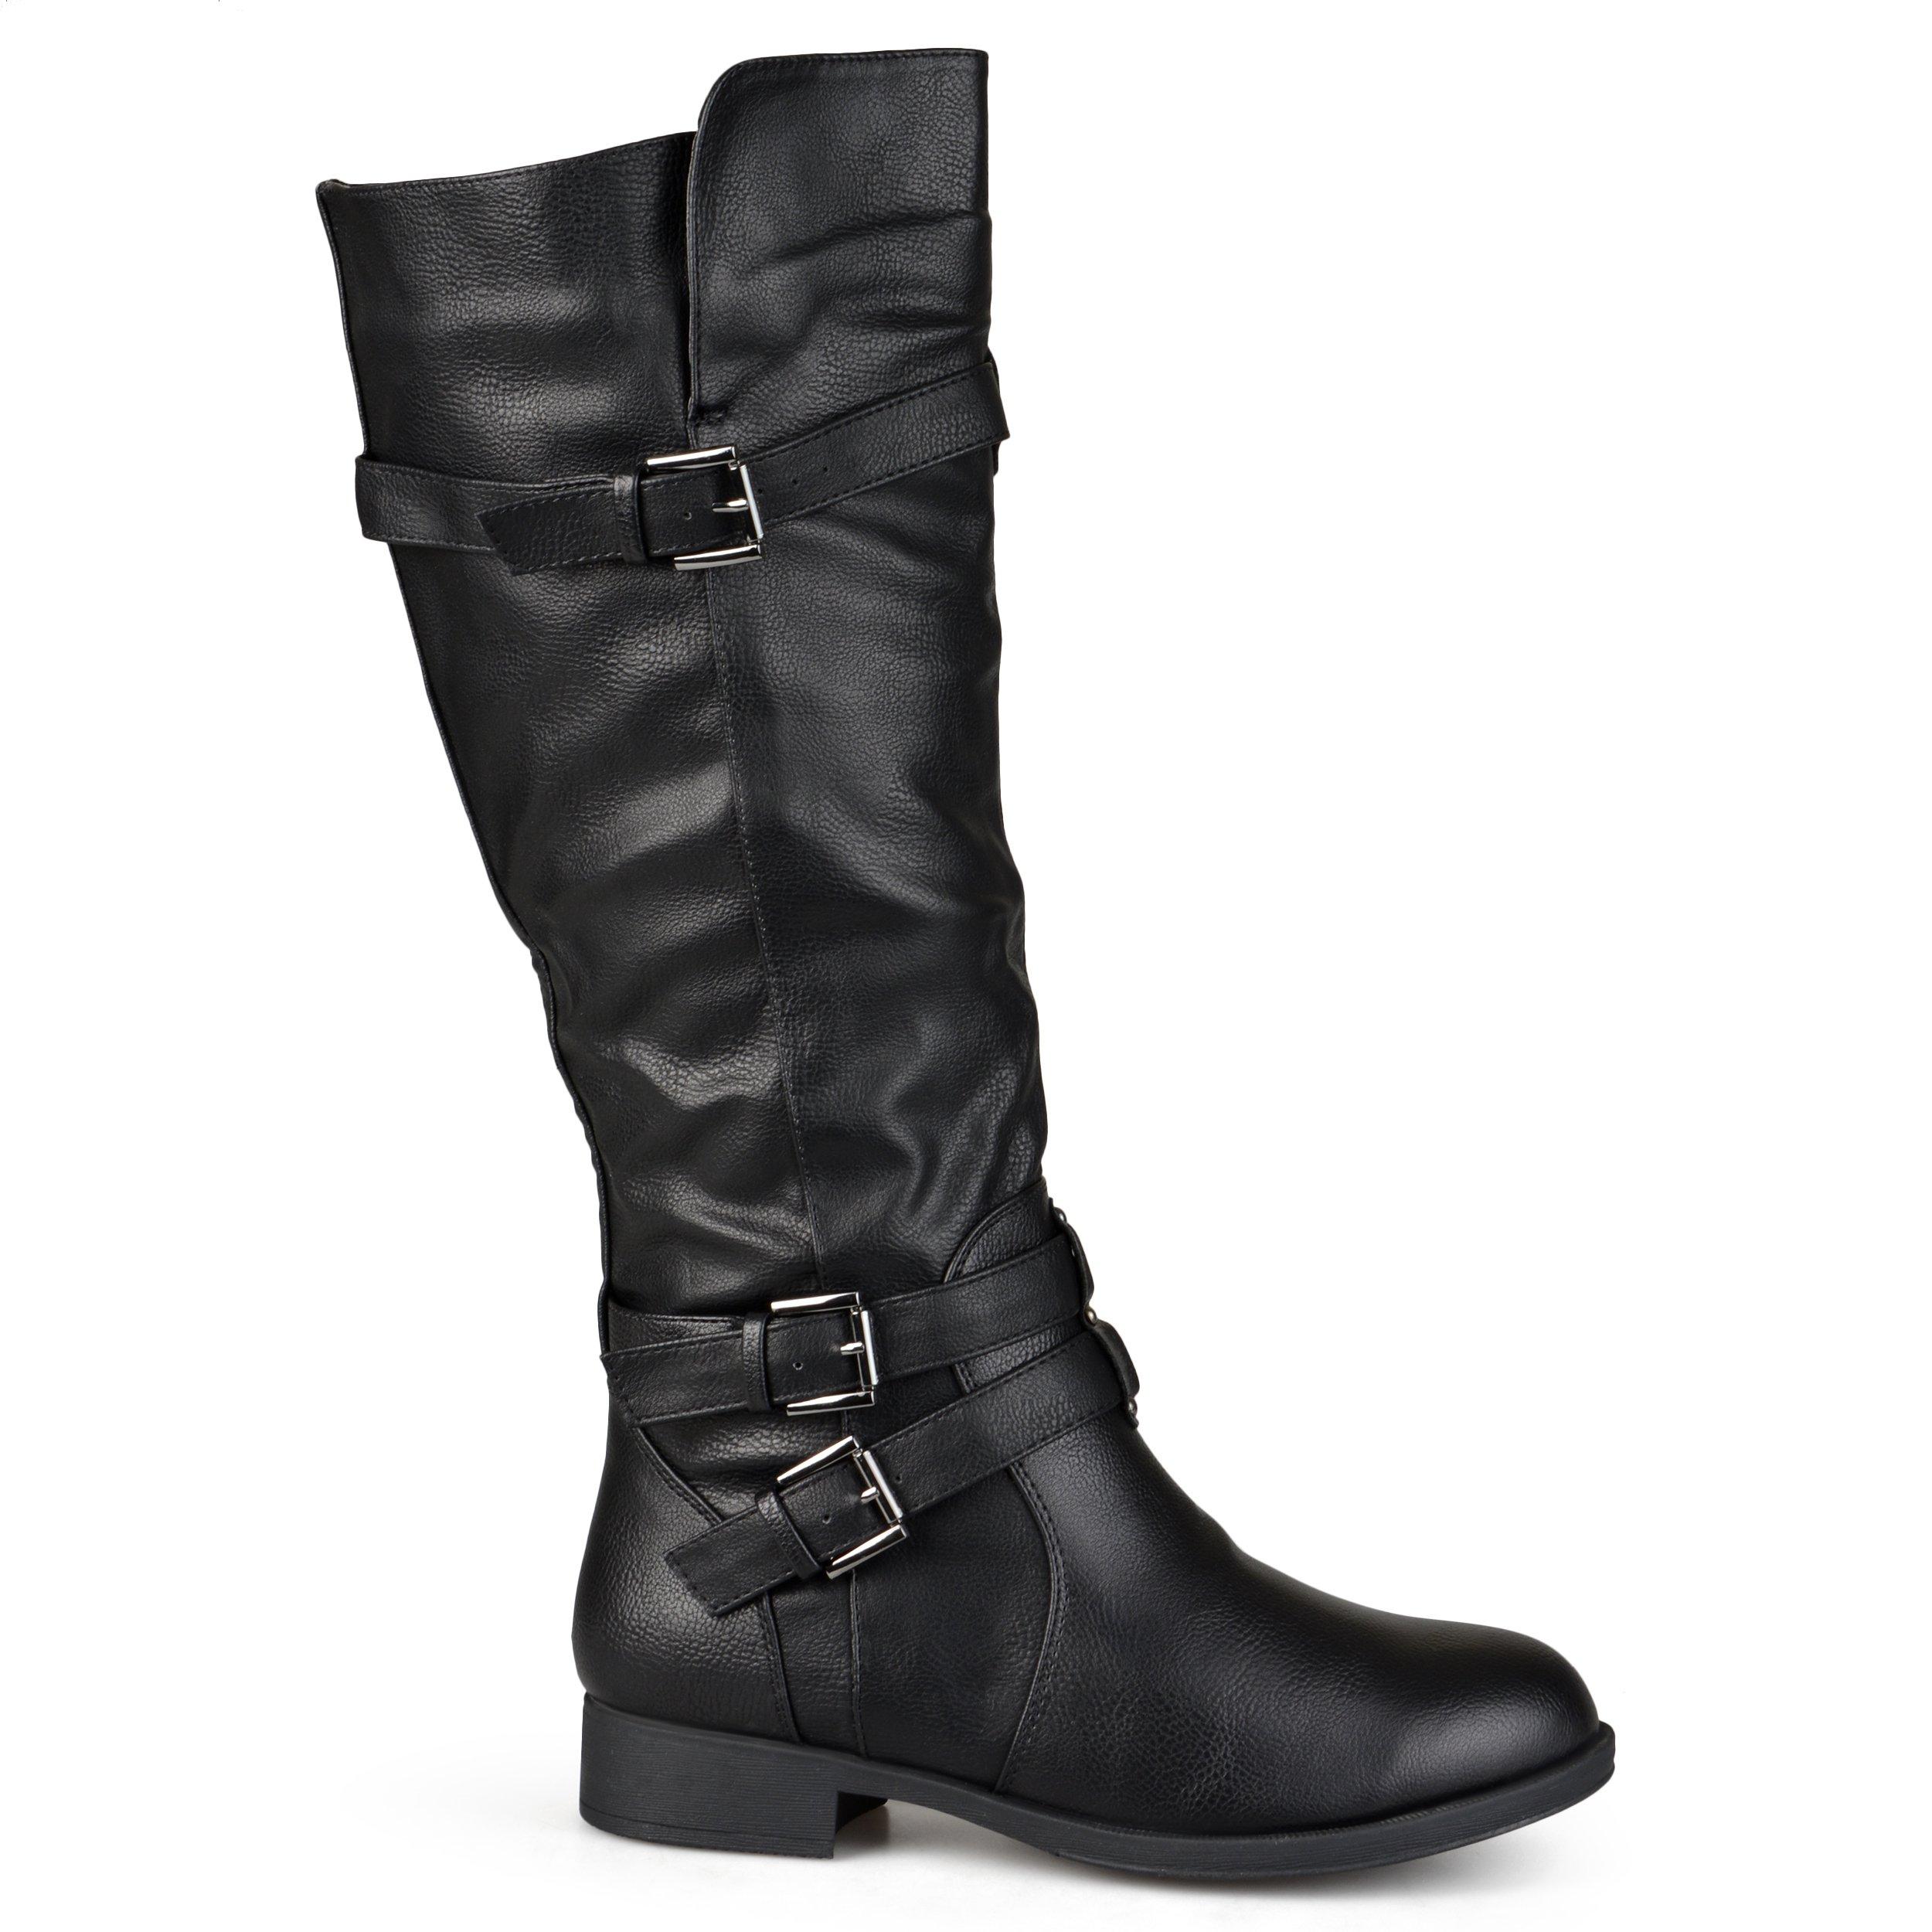 Brinley Co Women's Buffalo Knee High Boot, Black, 9.5 Wide/Wide Shaft US